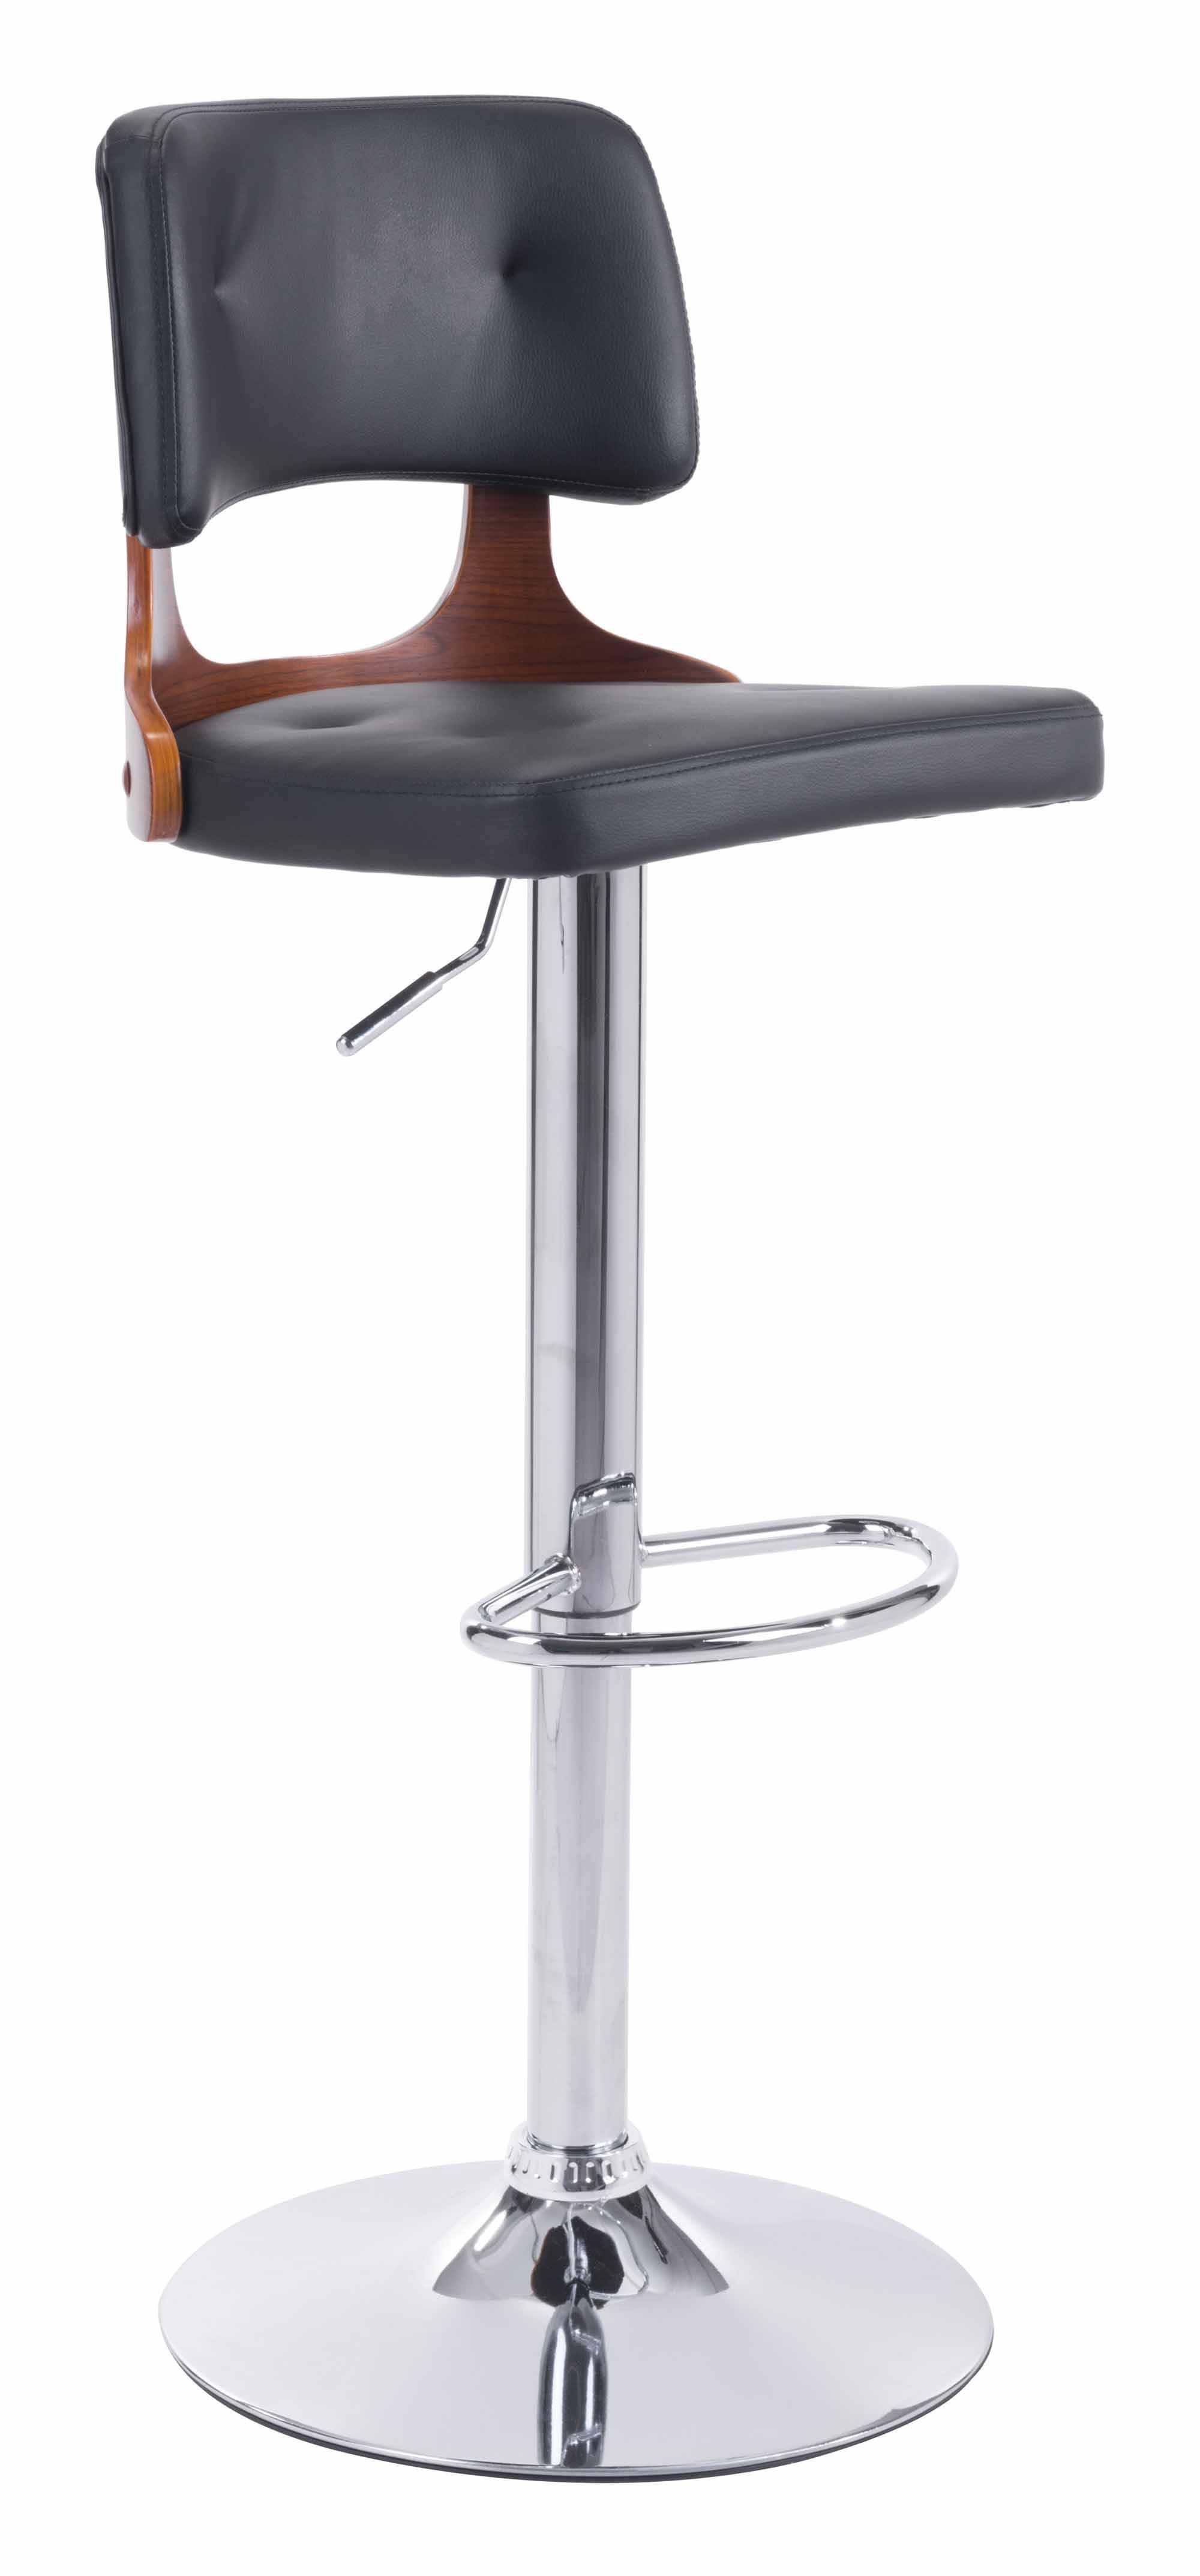 Swell Lynx Bar Chair Black By Zuo Modern Inzonedesignstudio Interior Chair Design Inzonedesignstudiocom